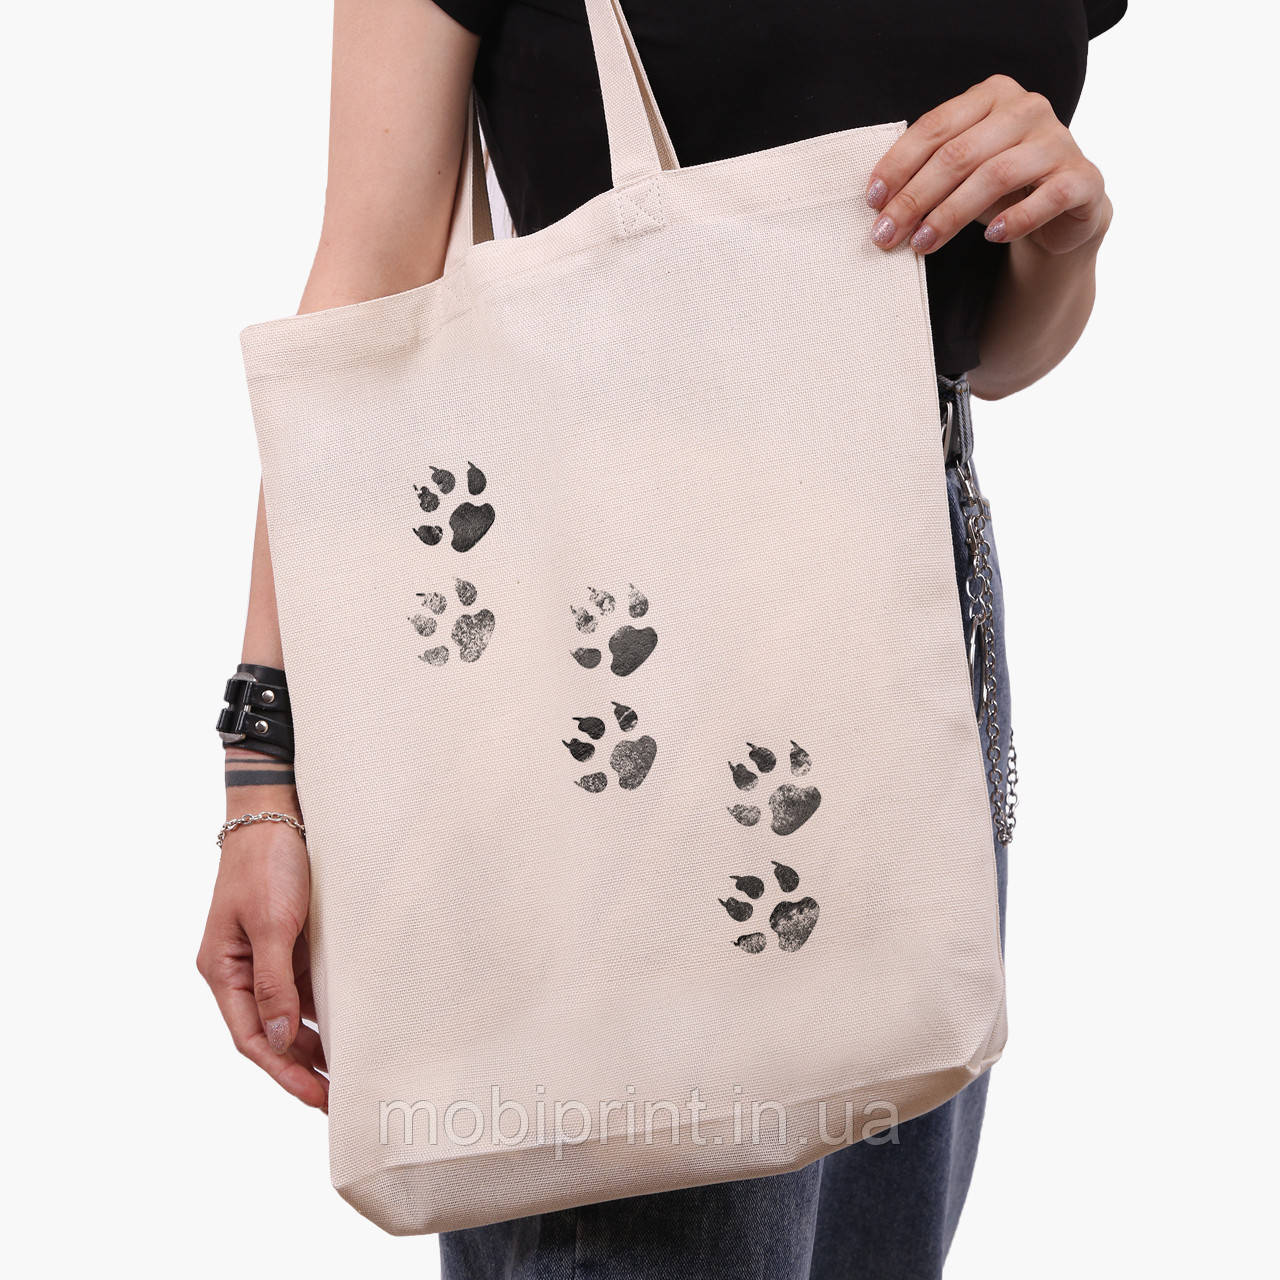 Эко сумка шоппер белая Лапки (Paws) (9227-1755-1)  экосумка шопер 41*39*8 см